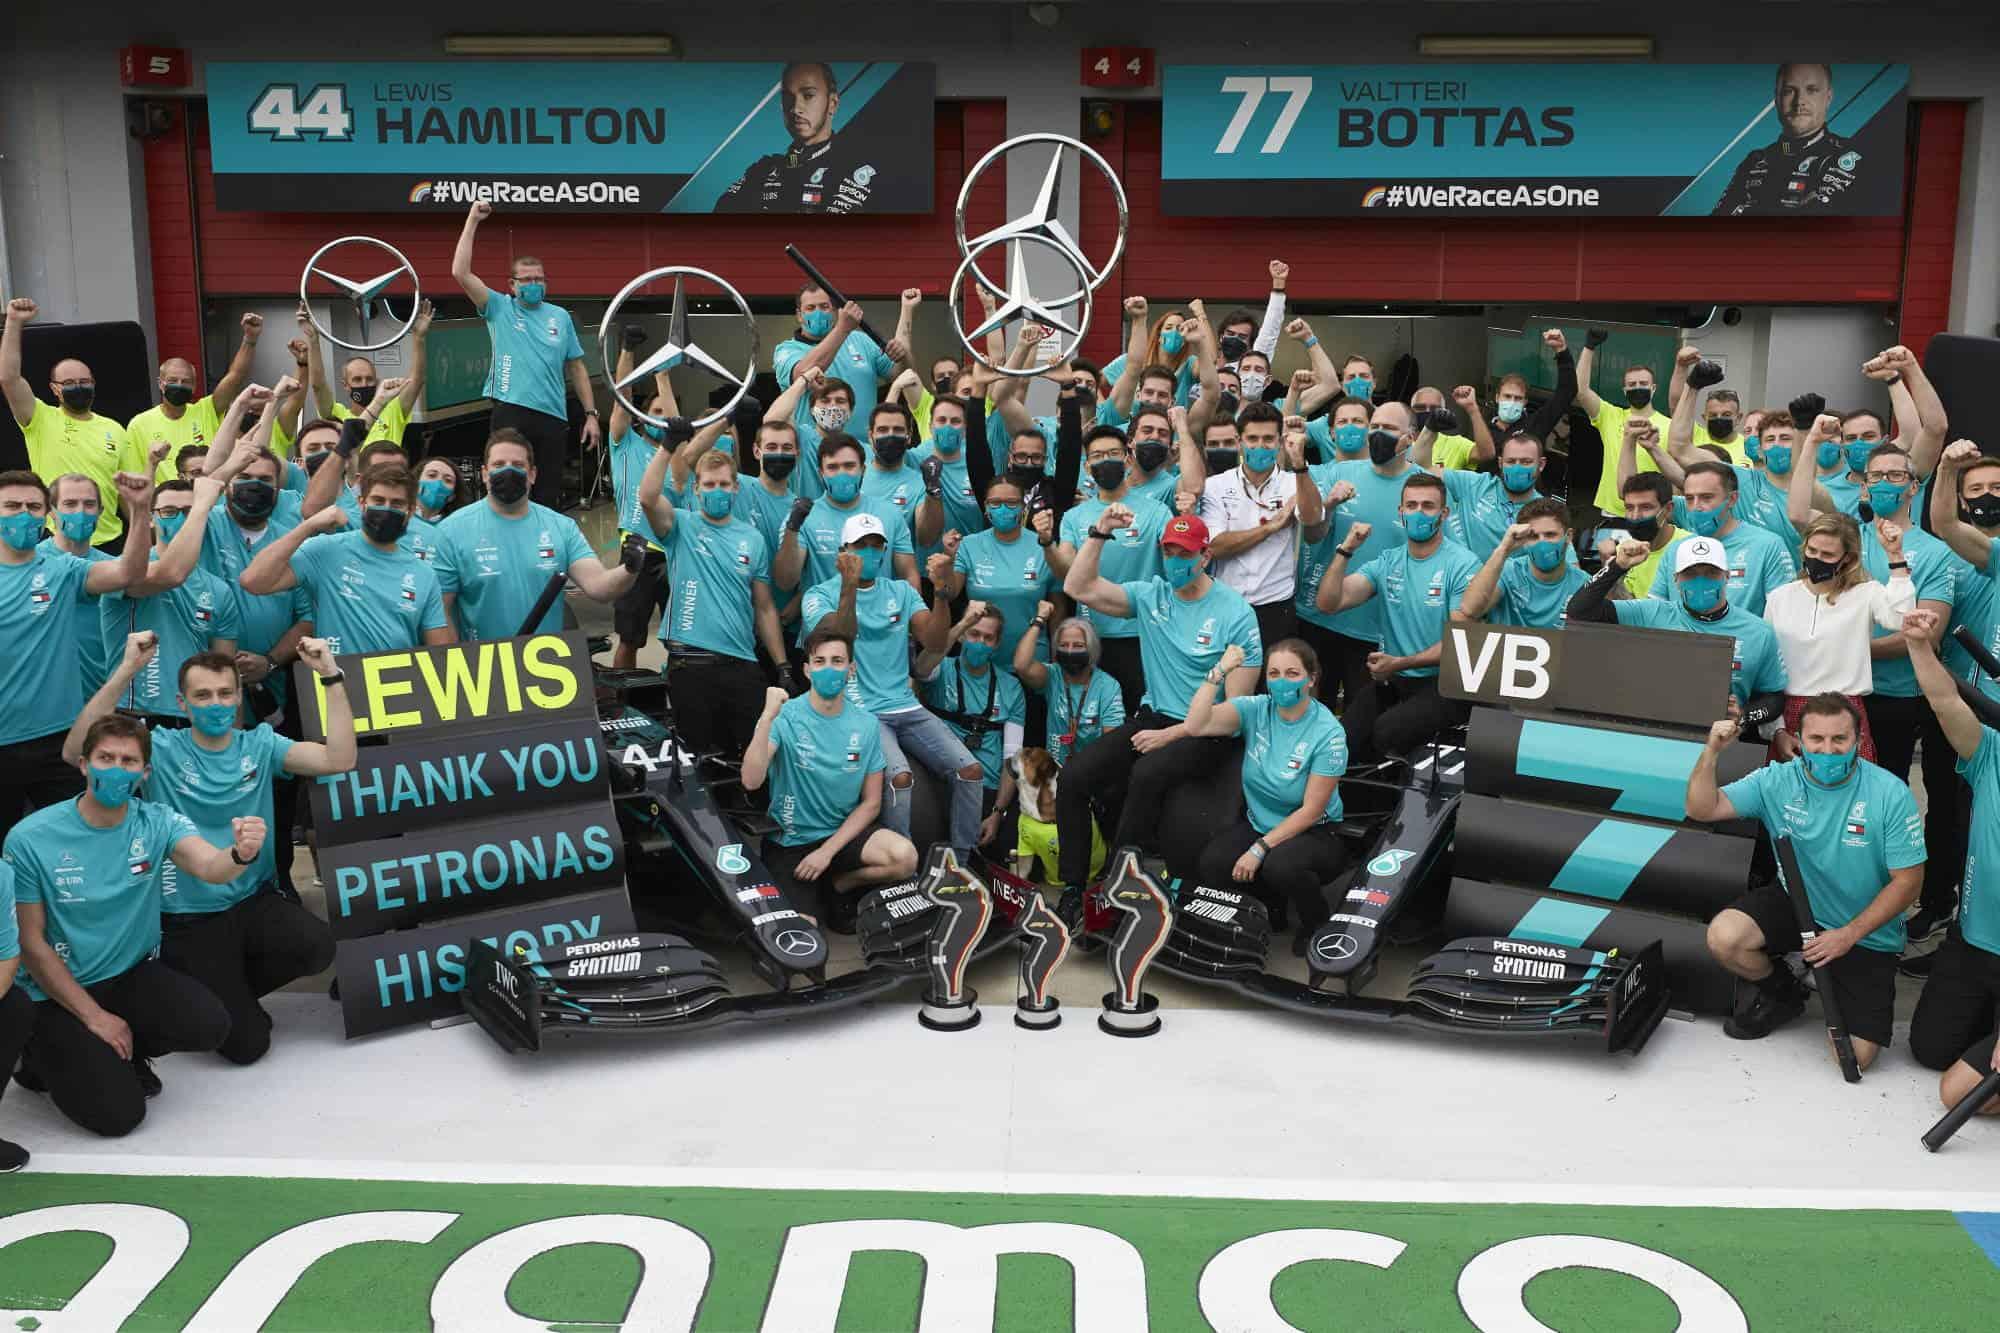 2020 Emilia Romagna Imola Hamilton Bottas Mercedes celebrate 1-2 and 7th constructors title Photo Daimler